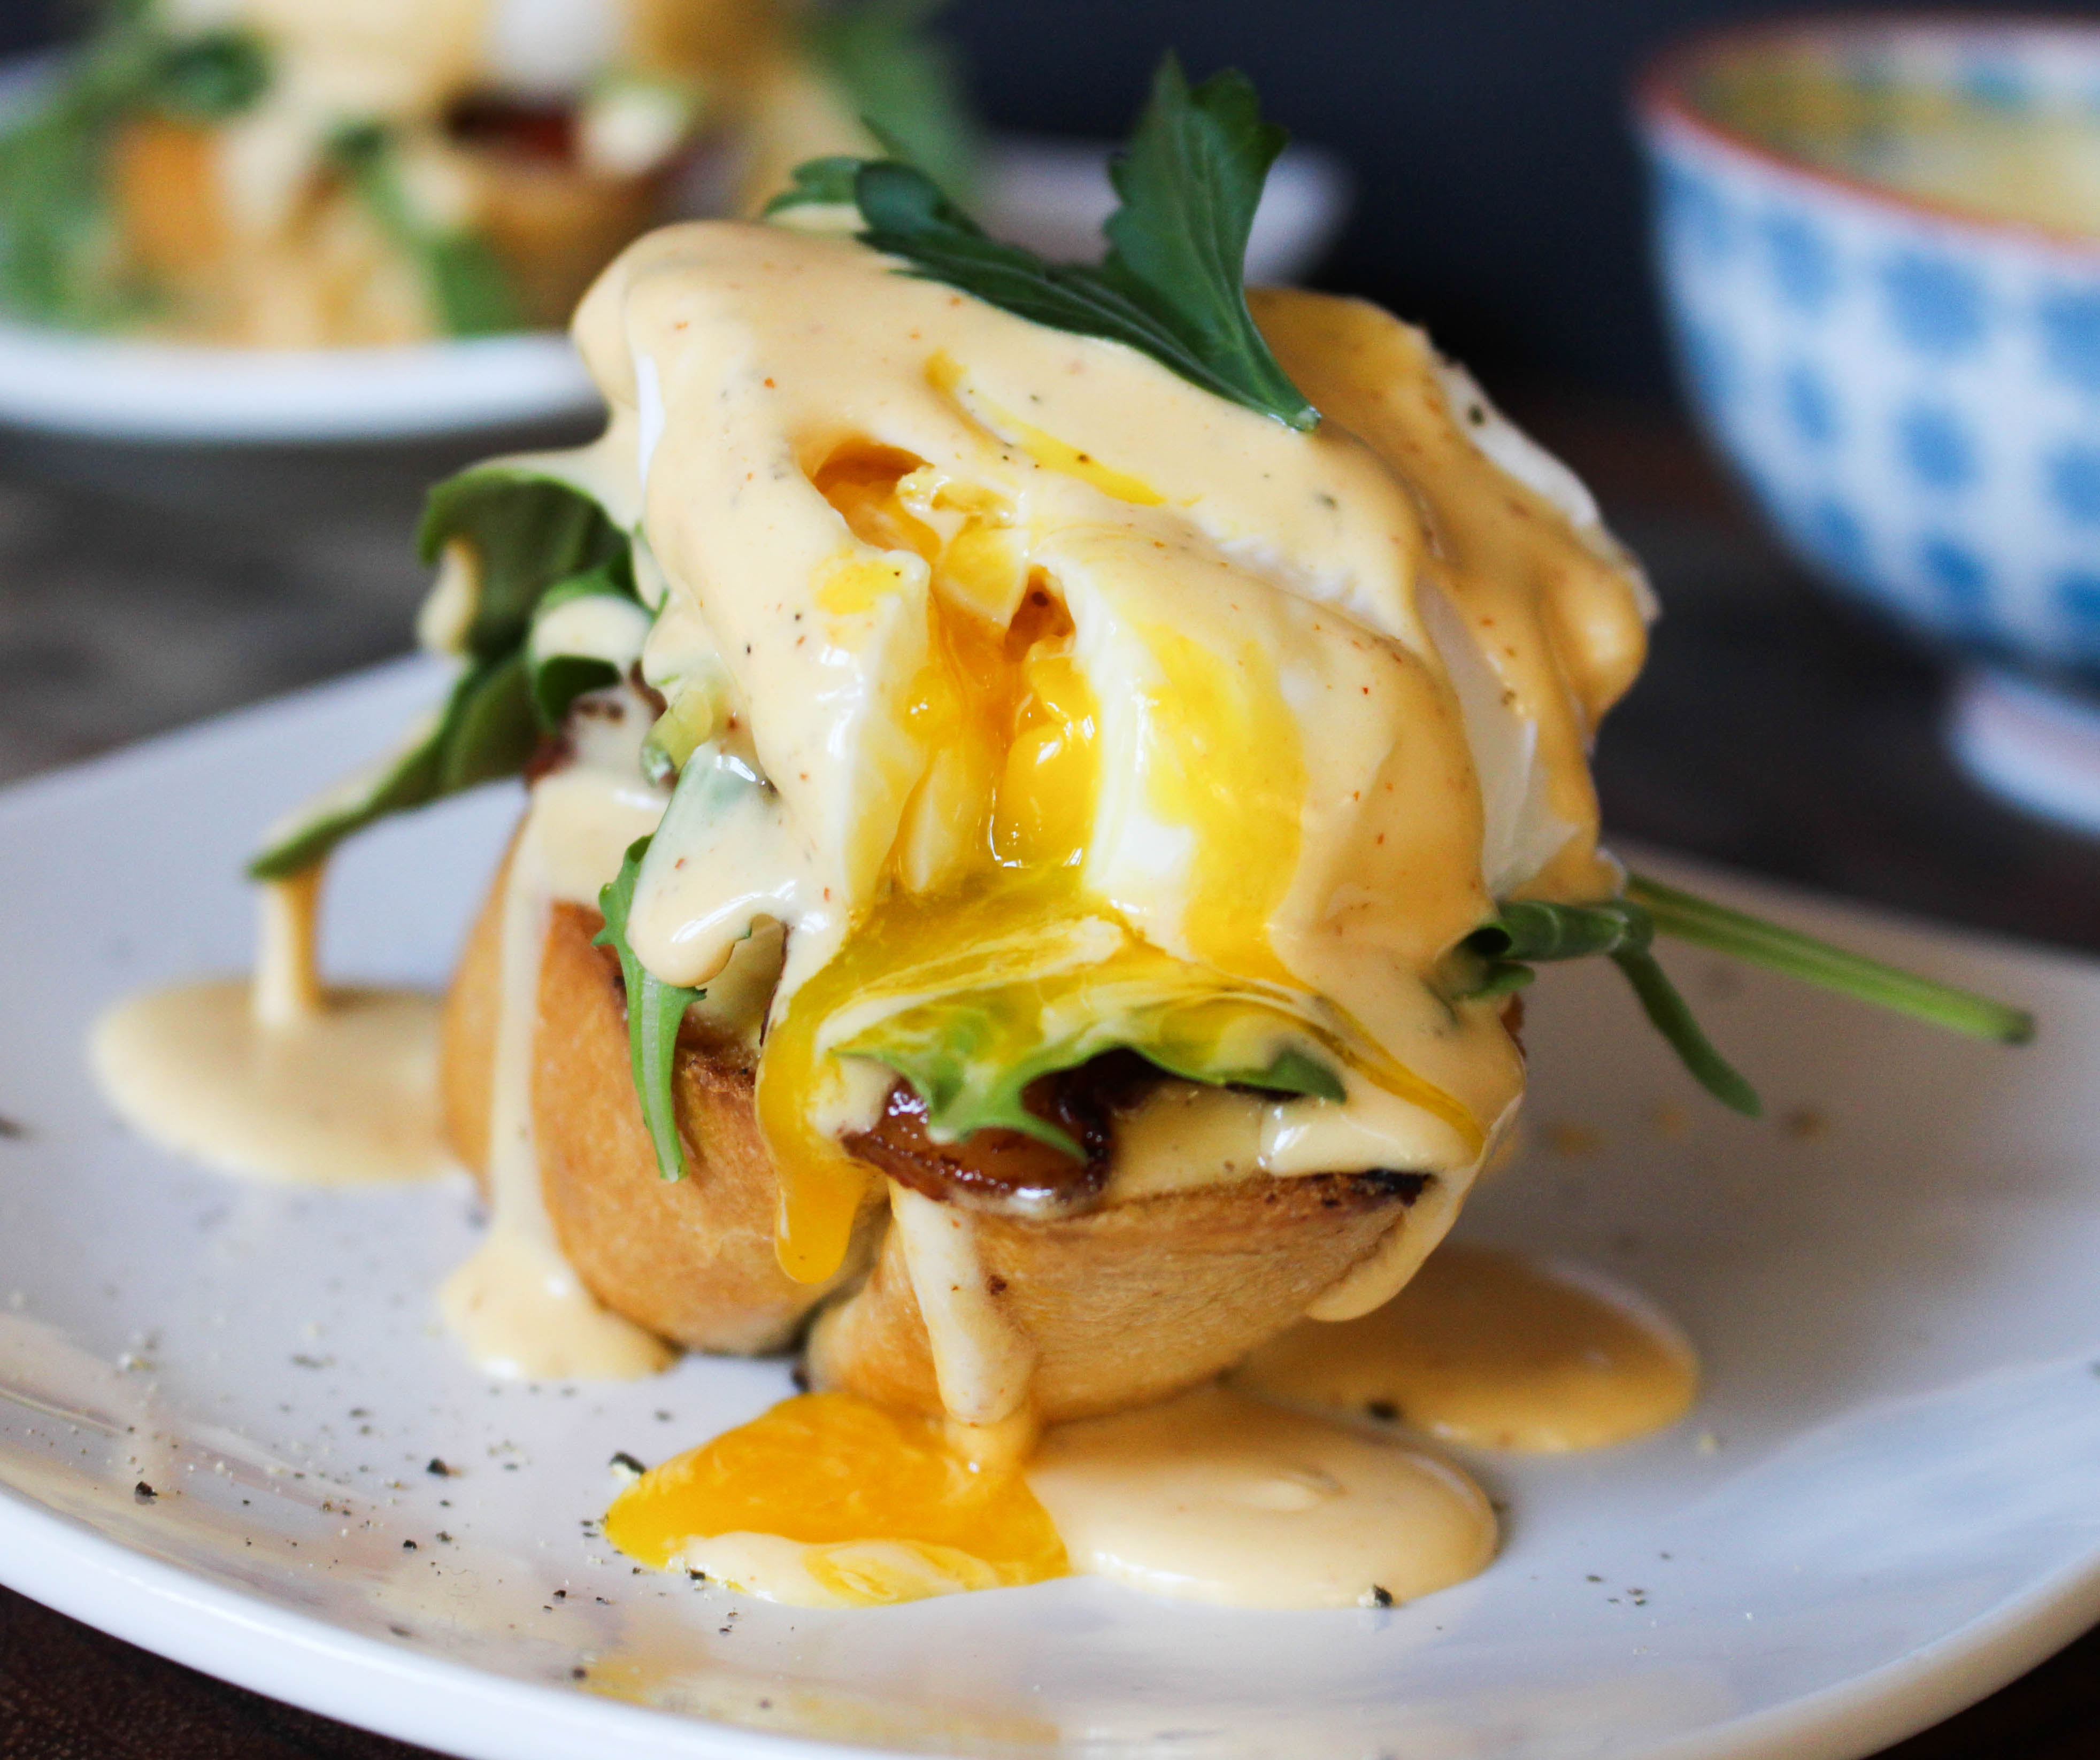 Eggs Benedict My Way With Sriracha Hollandaise